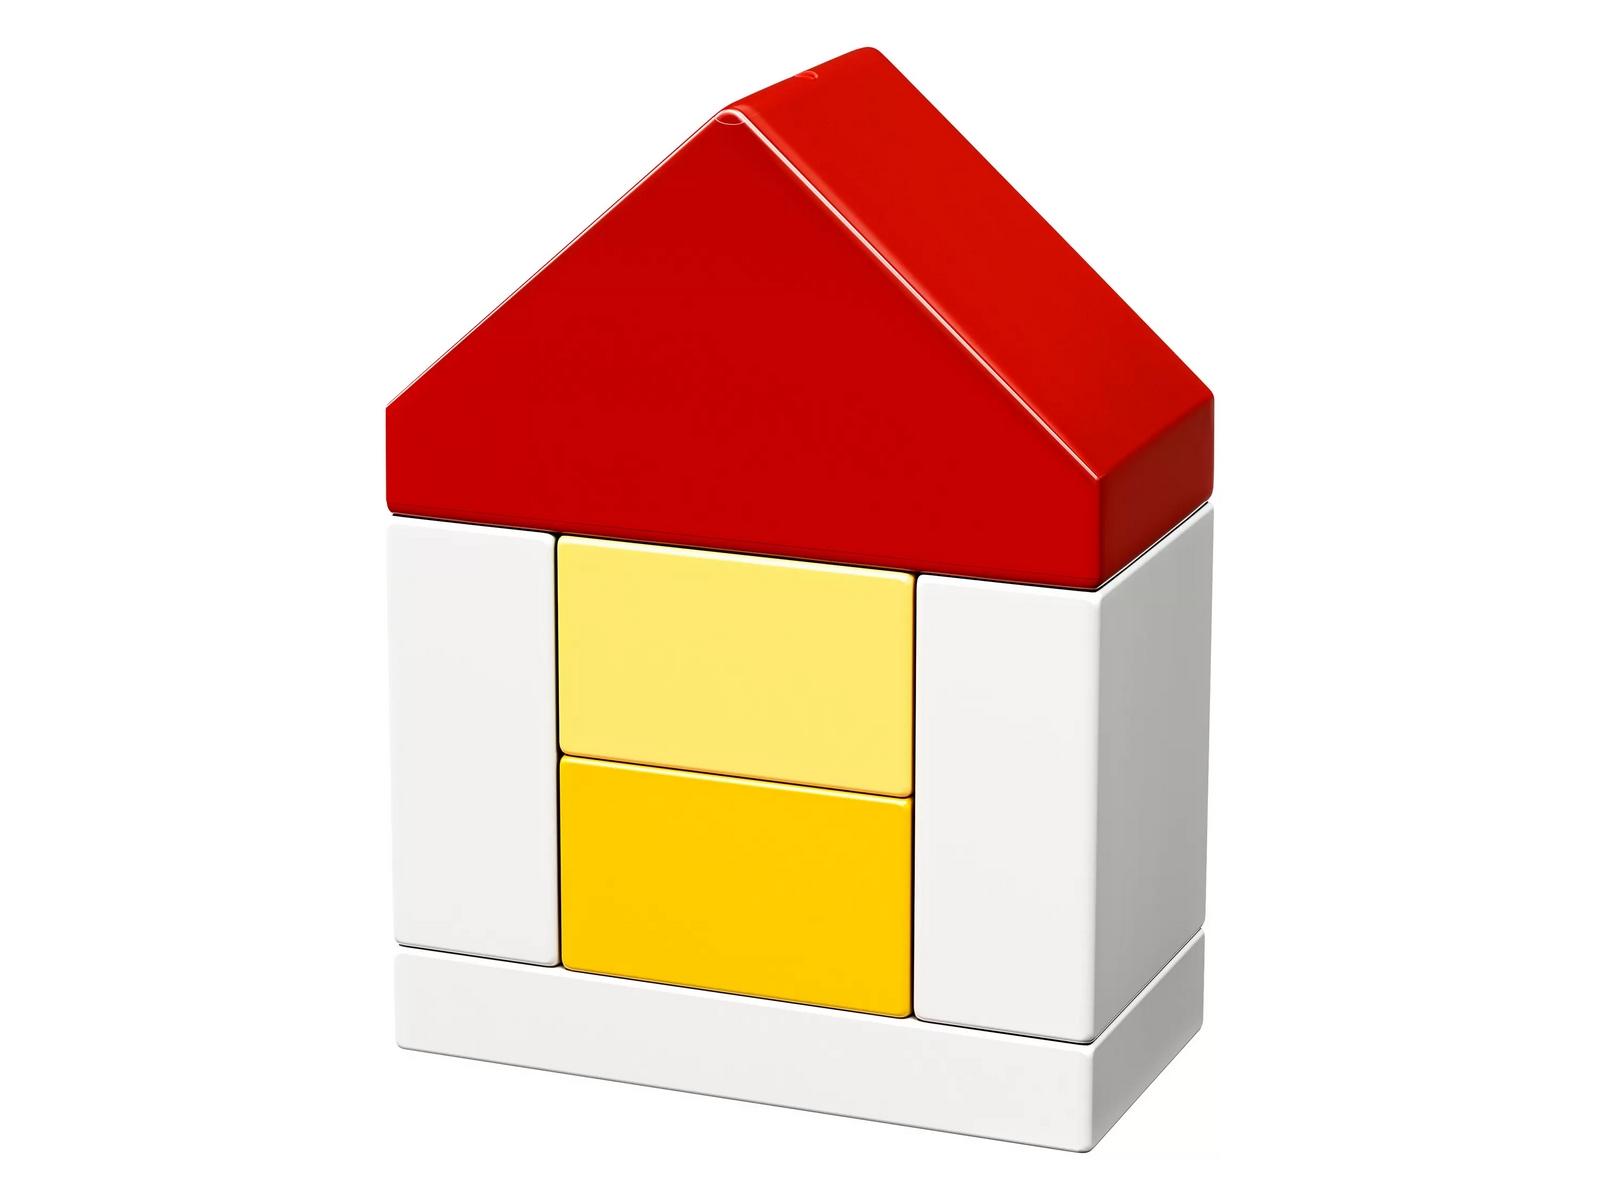 Конструктор LEGO Duplo Classic «Шкатулка-сердечко» 10909 / 80 деталей